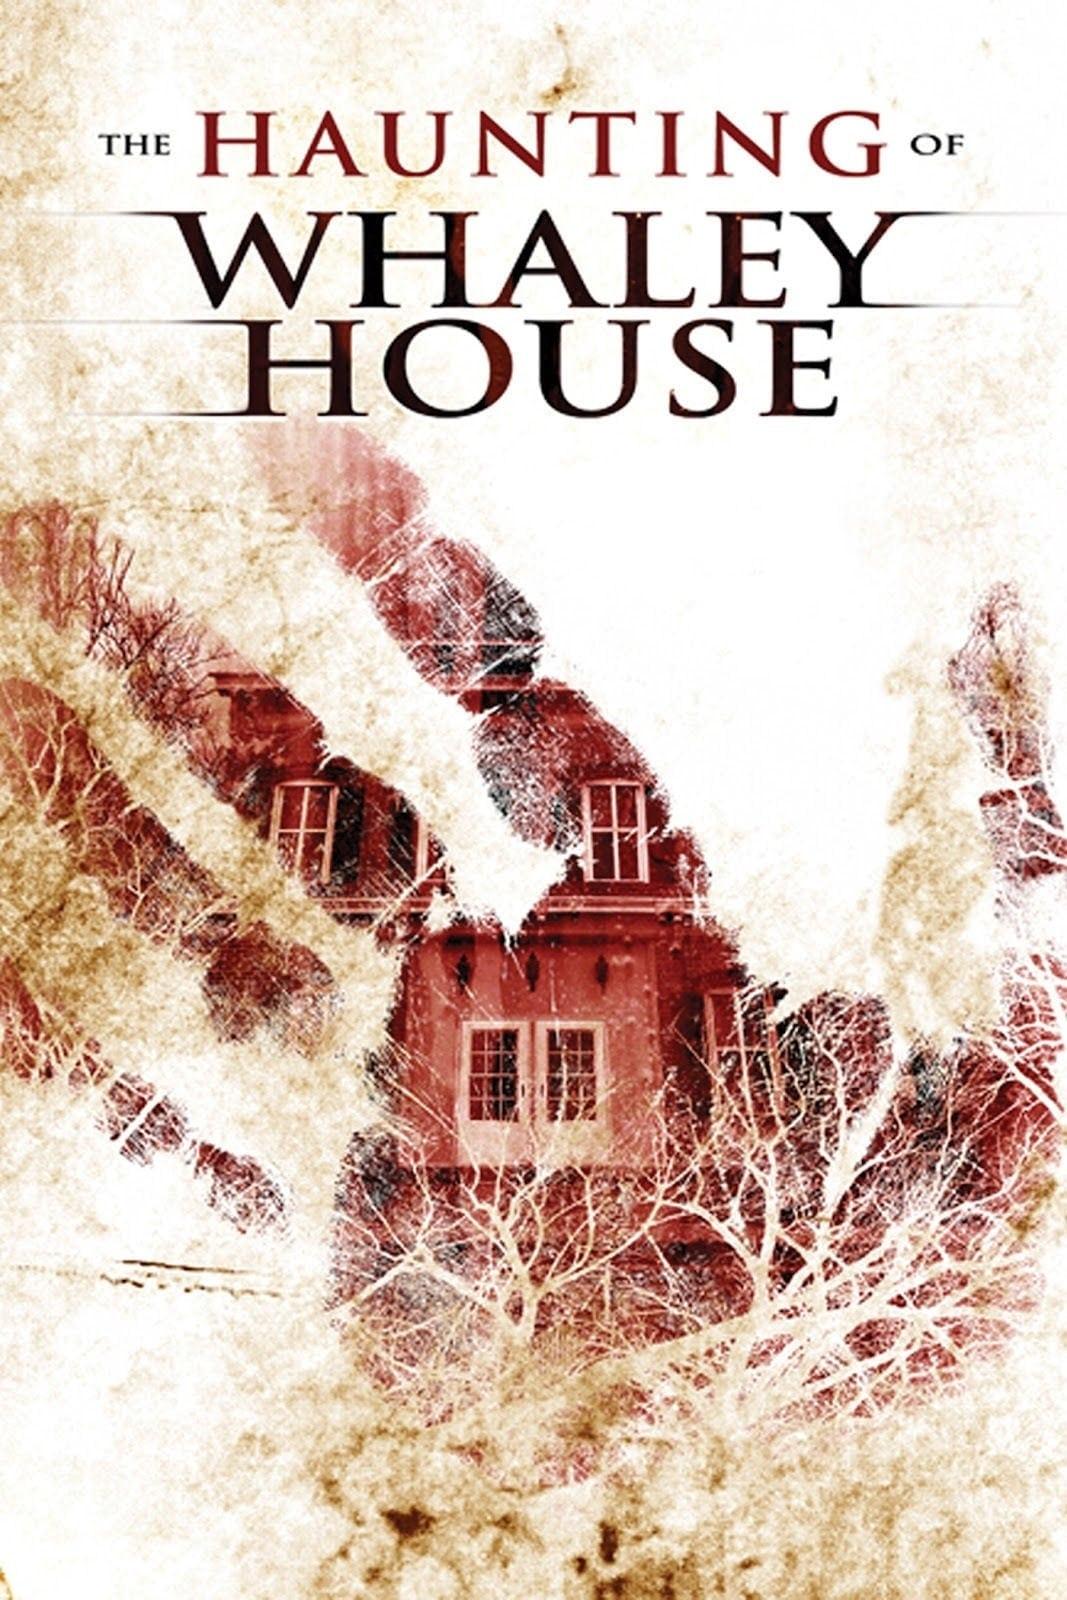 La Maldicion de la Casa Whaley